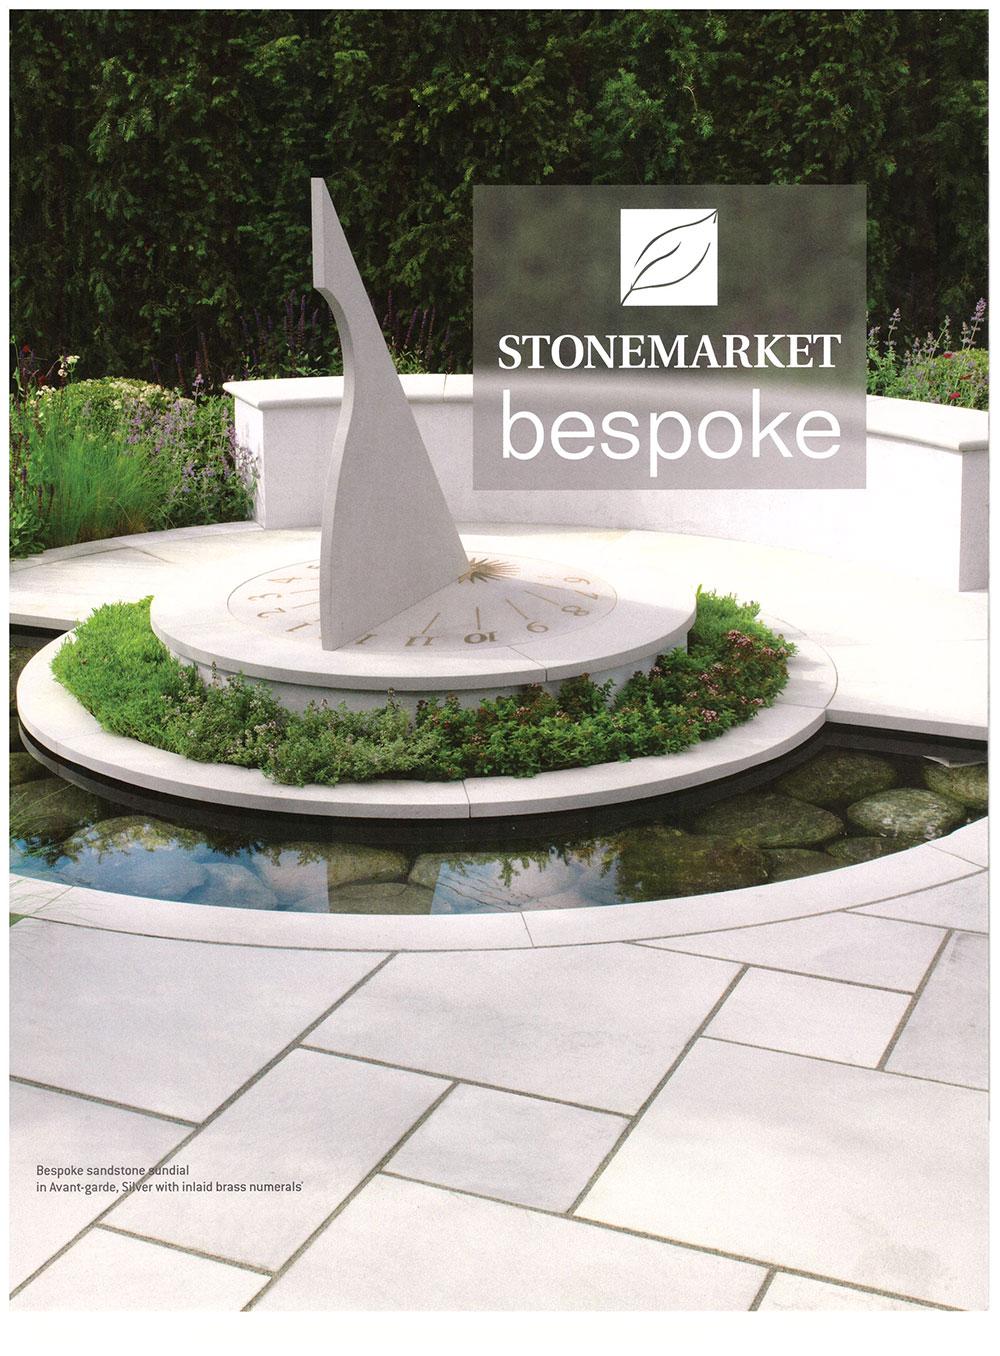 Stonemarket Bespoke